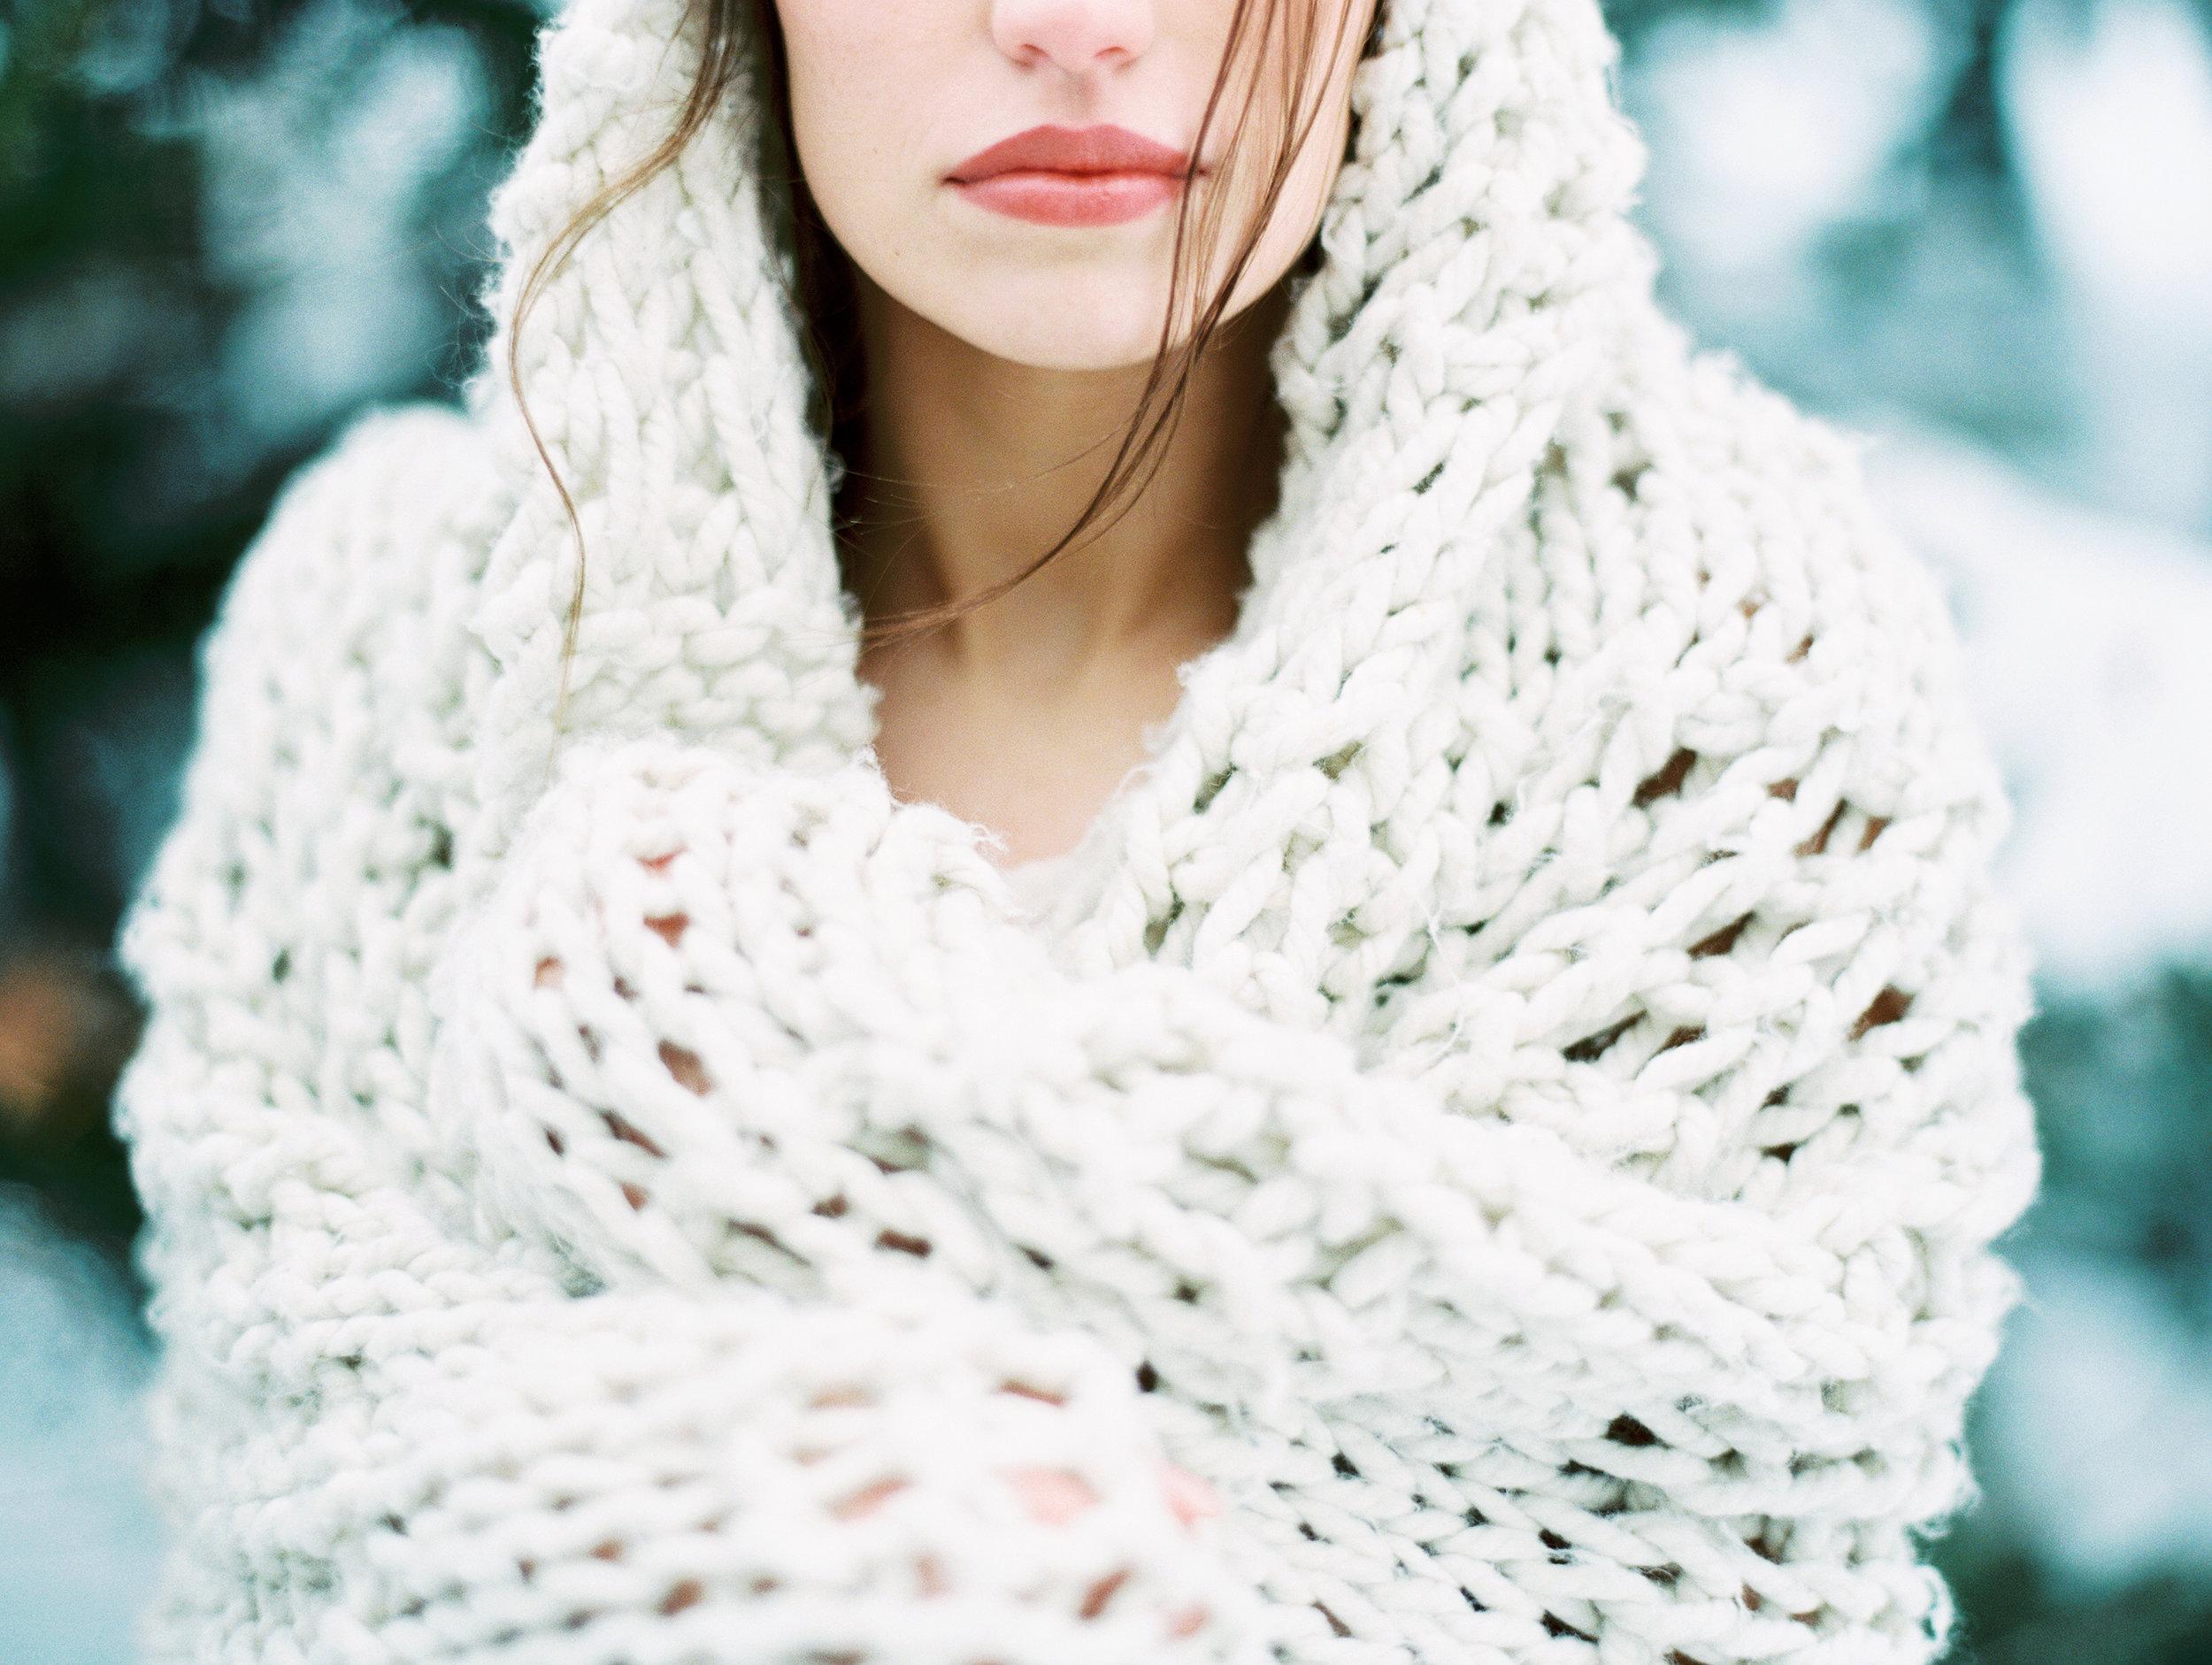 BellaCosa_WinterWonderland-17.jpg